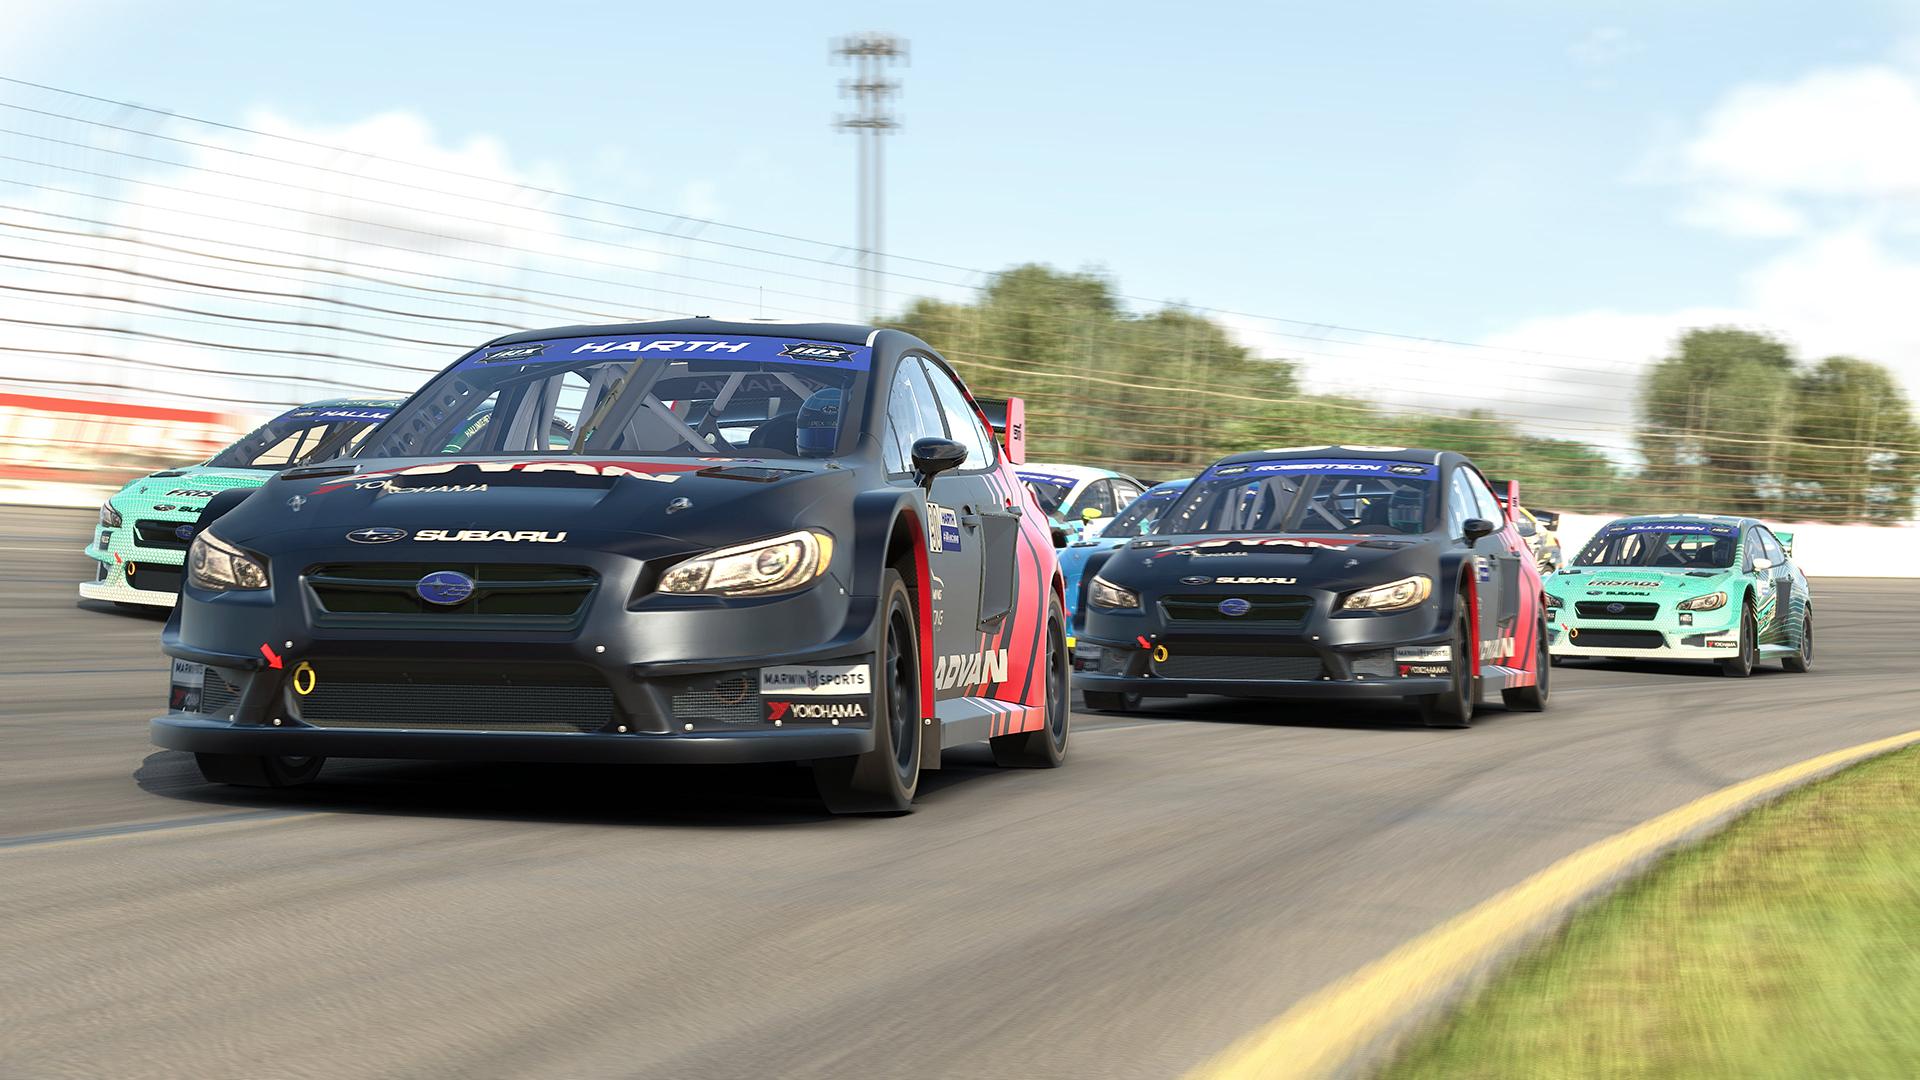 IRX World Championship presented by Yokohama – Round 7 – Lucas Oil Raceway